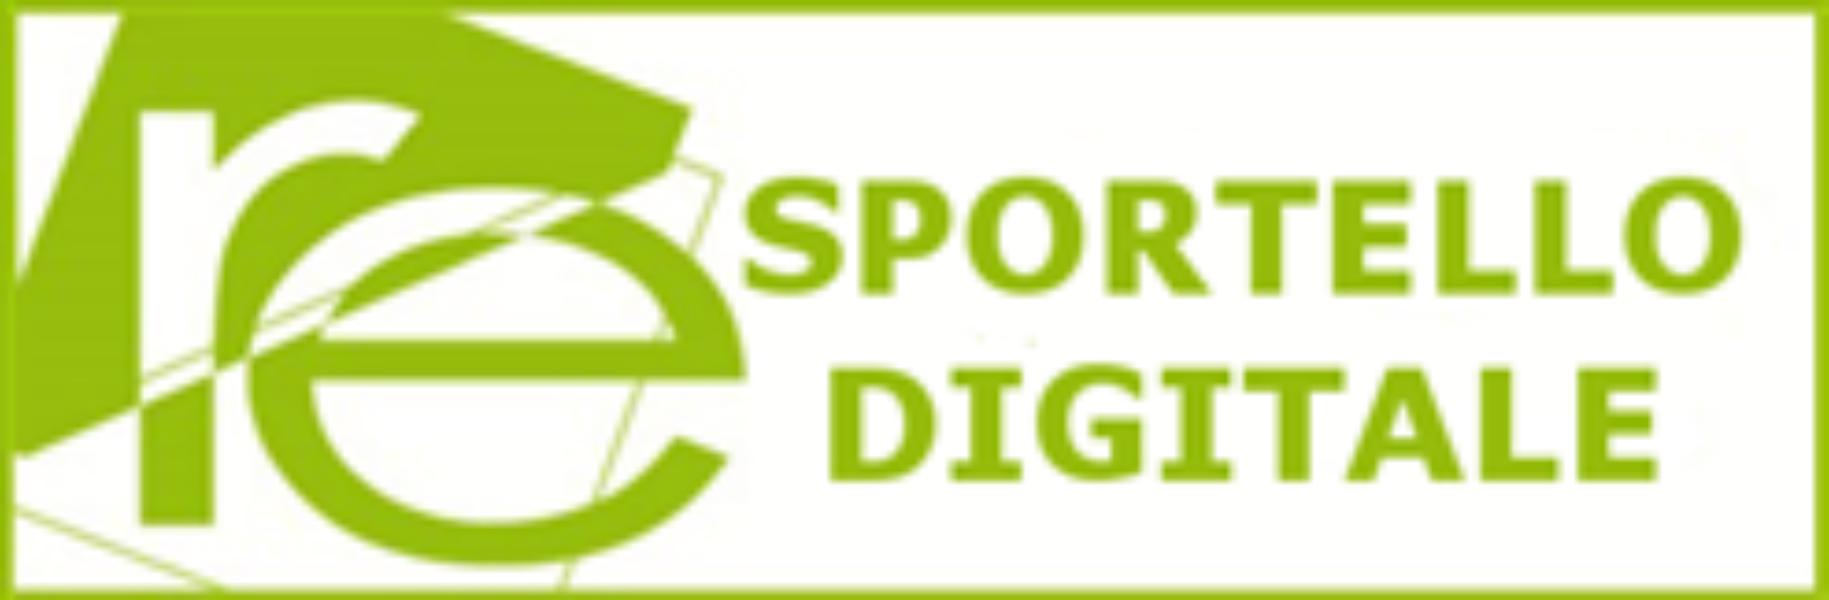 Sportello Digitale